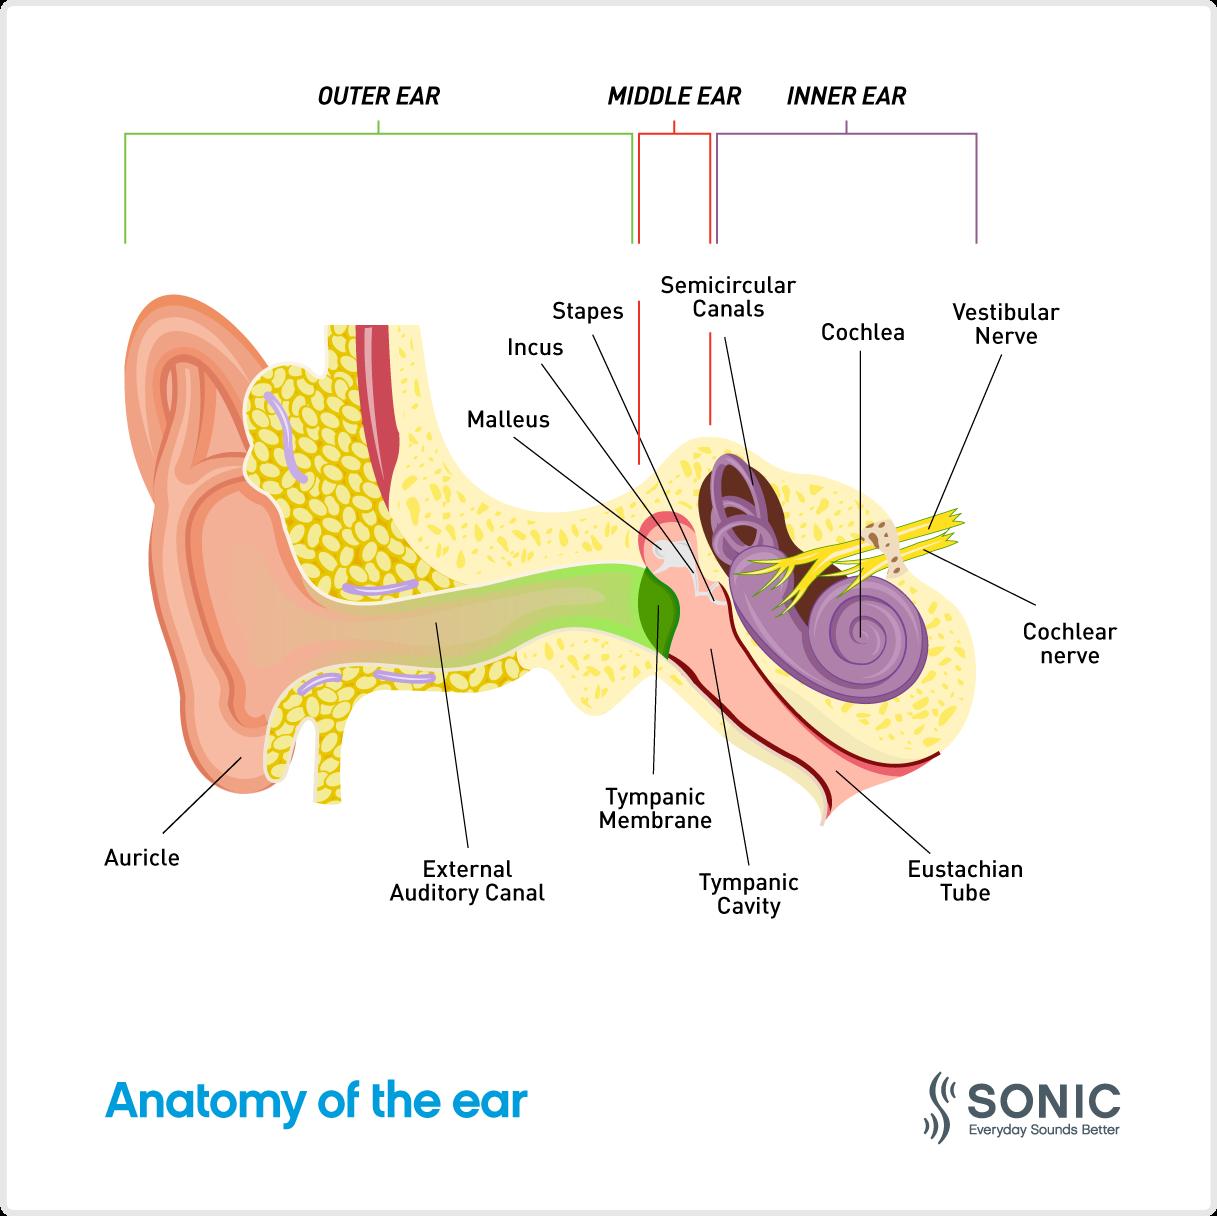 anatomy-of-the-ear